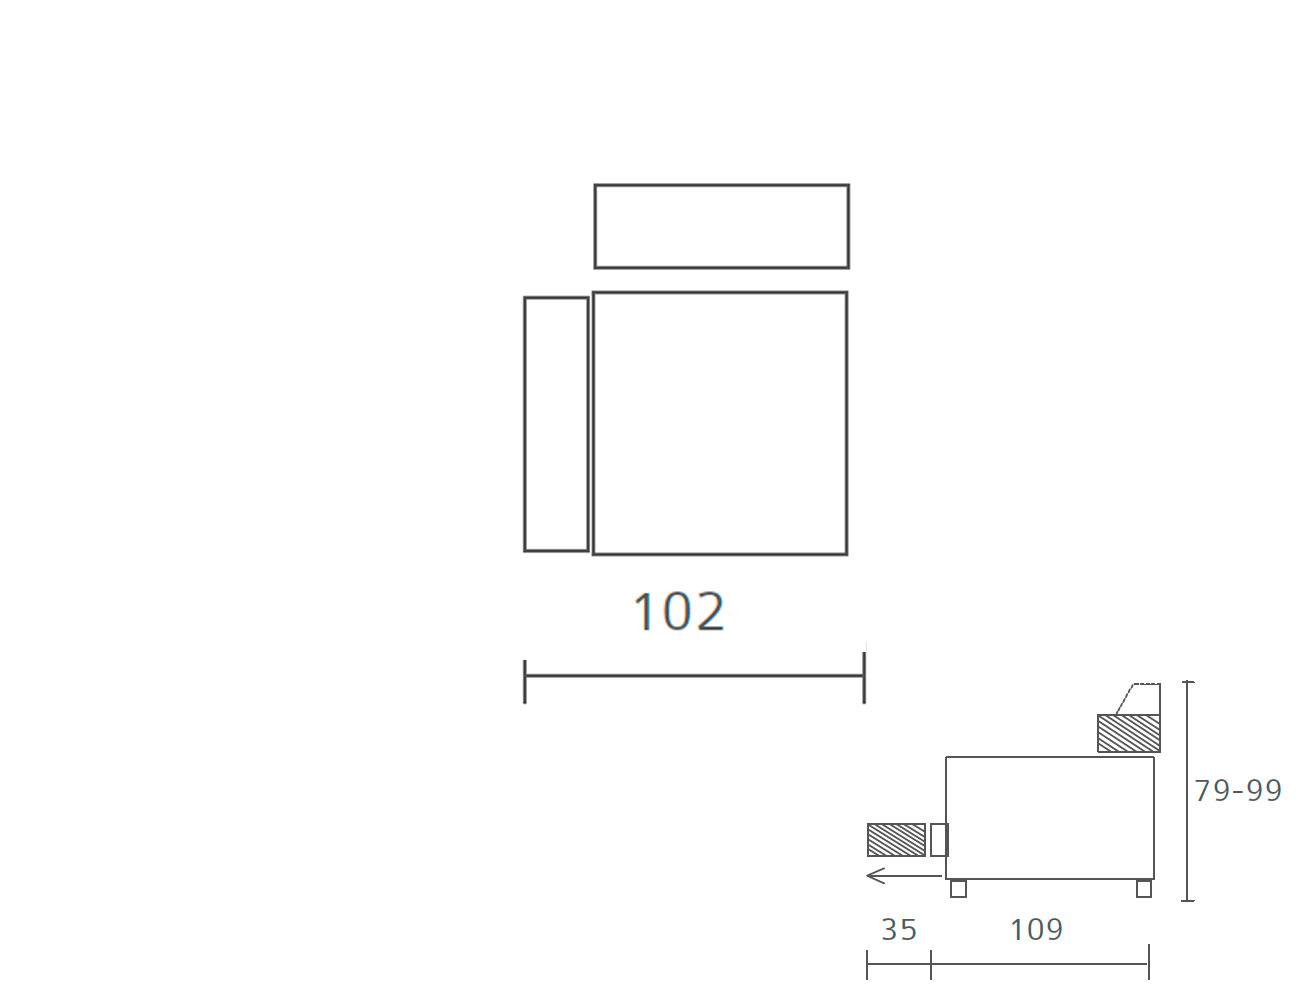 Sofa piel 1 plaza 1021